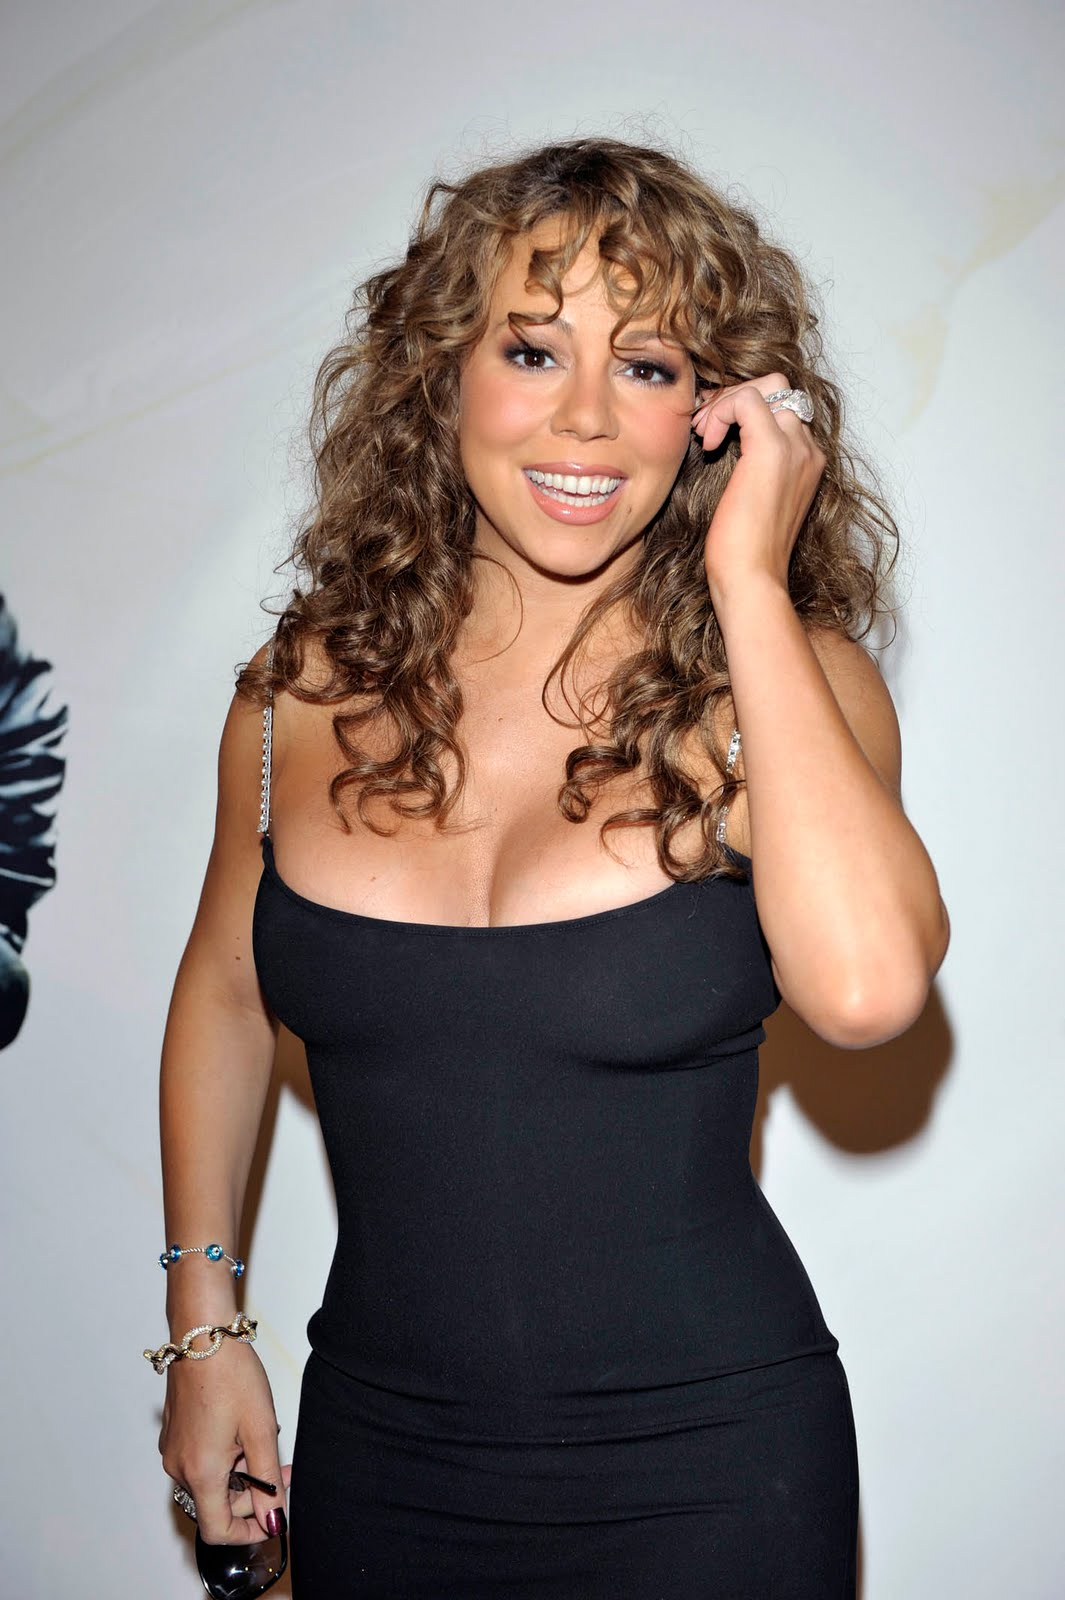 http://2.bp.blogspot.com/_6WjpEjfw51o/TGXraop0YCI/AAAAAAAAGJA/t7ADsnbDSy4/s1600/mariah_carey_fat_cleavage_dress.jpg